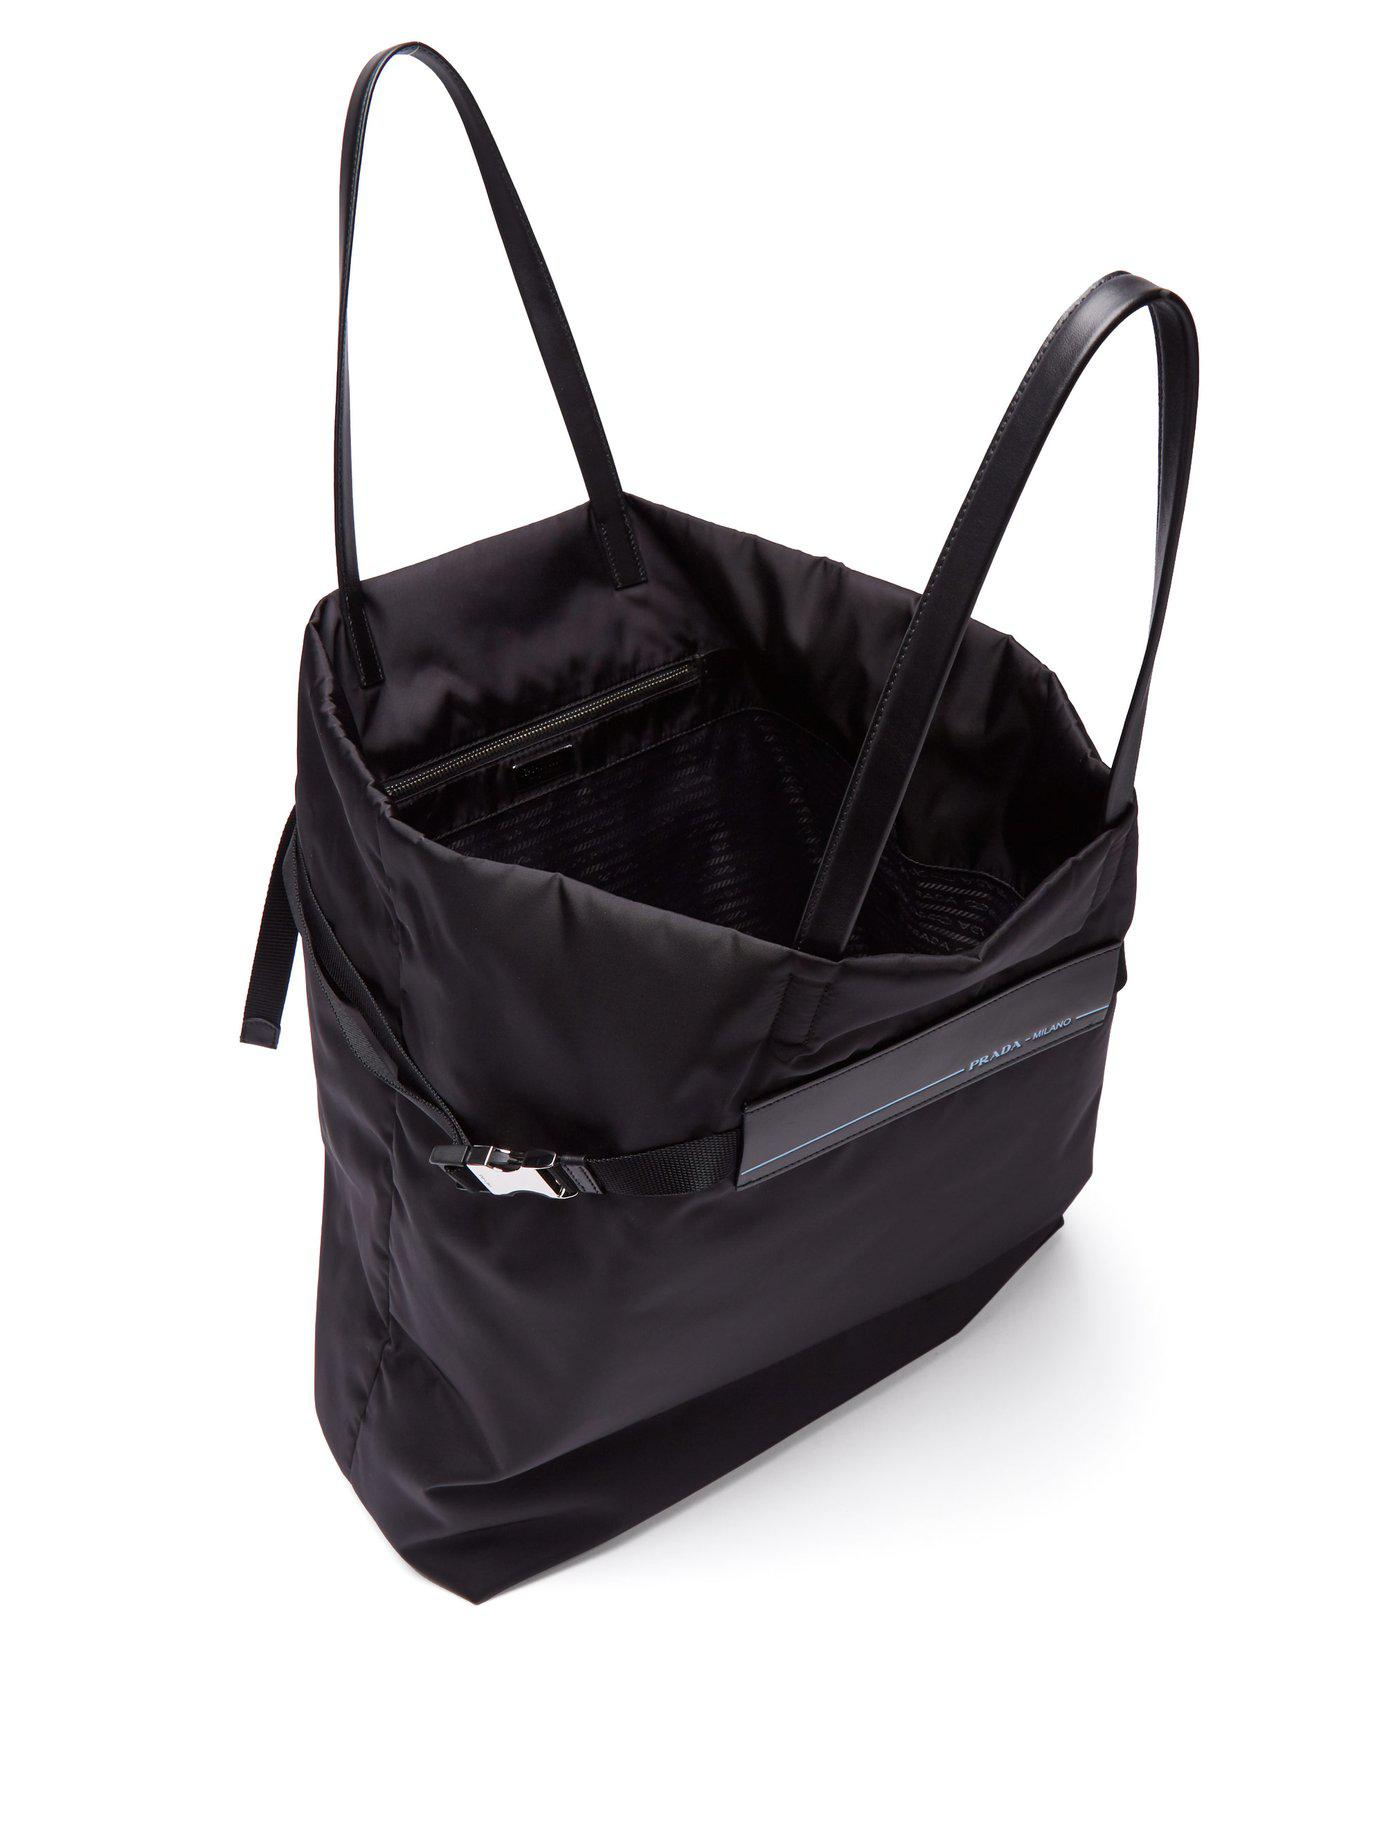 65a68c6e278a Prada - Black Logo Patch Nylon Tote Bag - Lyst. View fullscreen